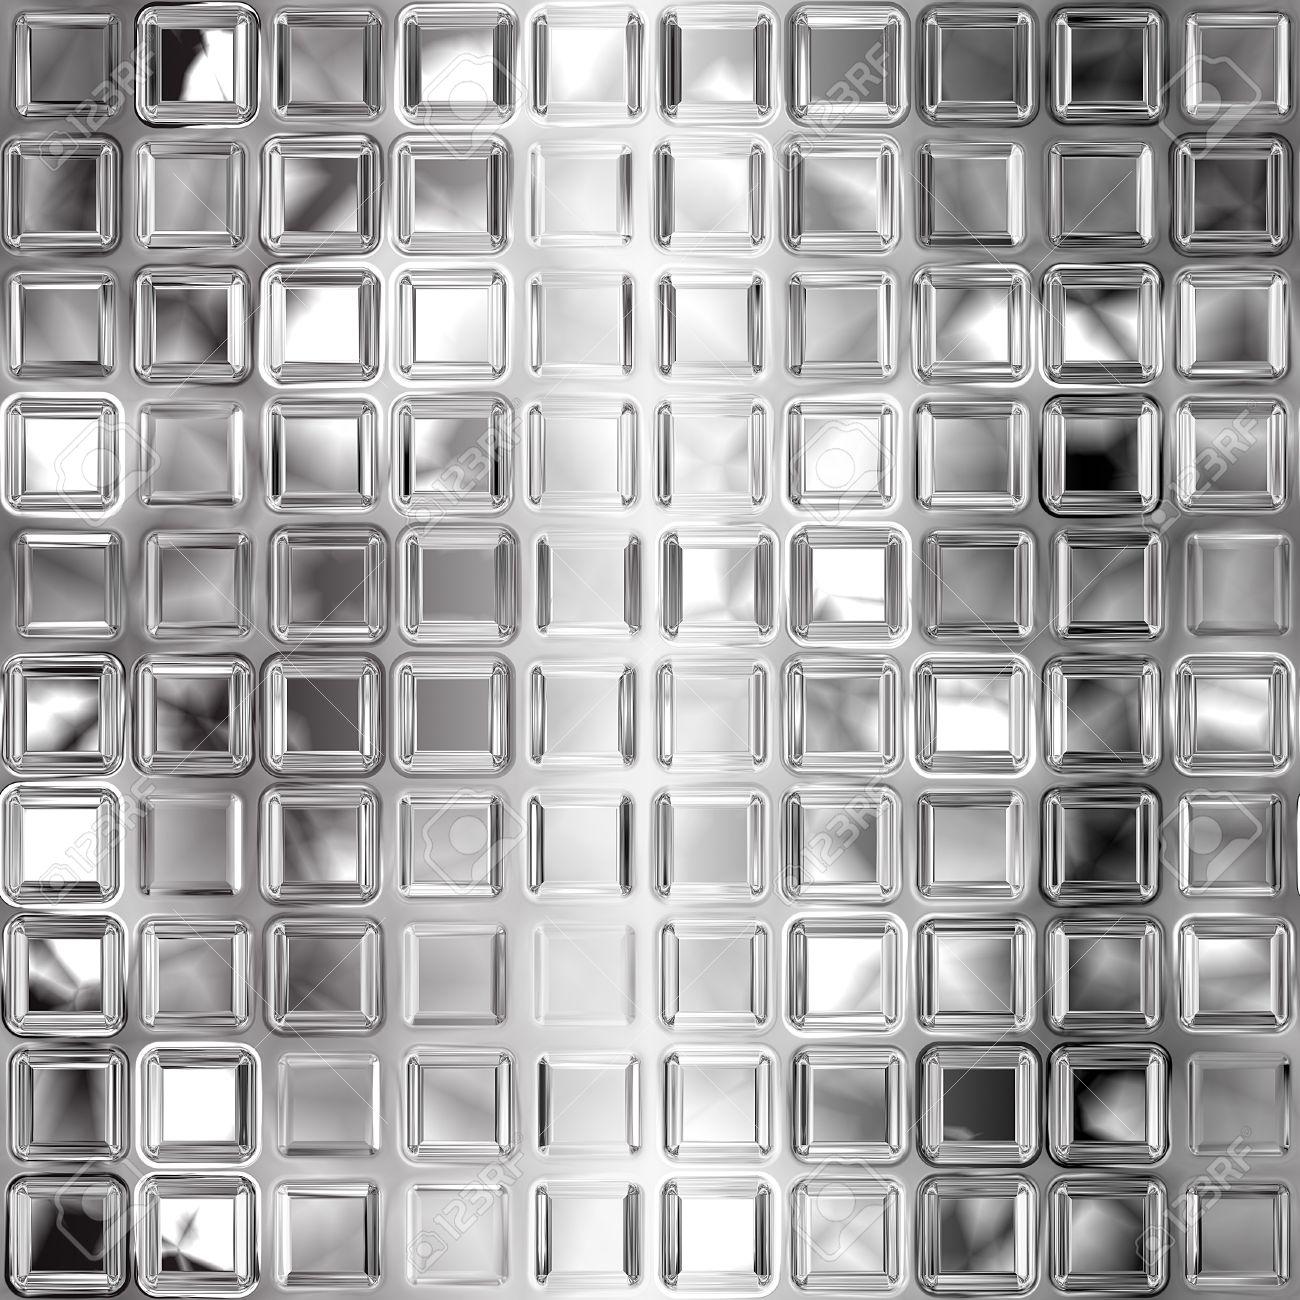 Seamless black and white glass tiles texture Stock Photo   7450410. Seamless Black And White Glass Tiles Texture Stock Photo  Picture